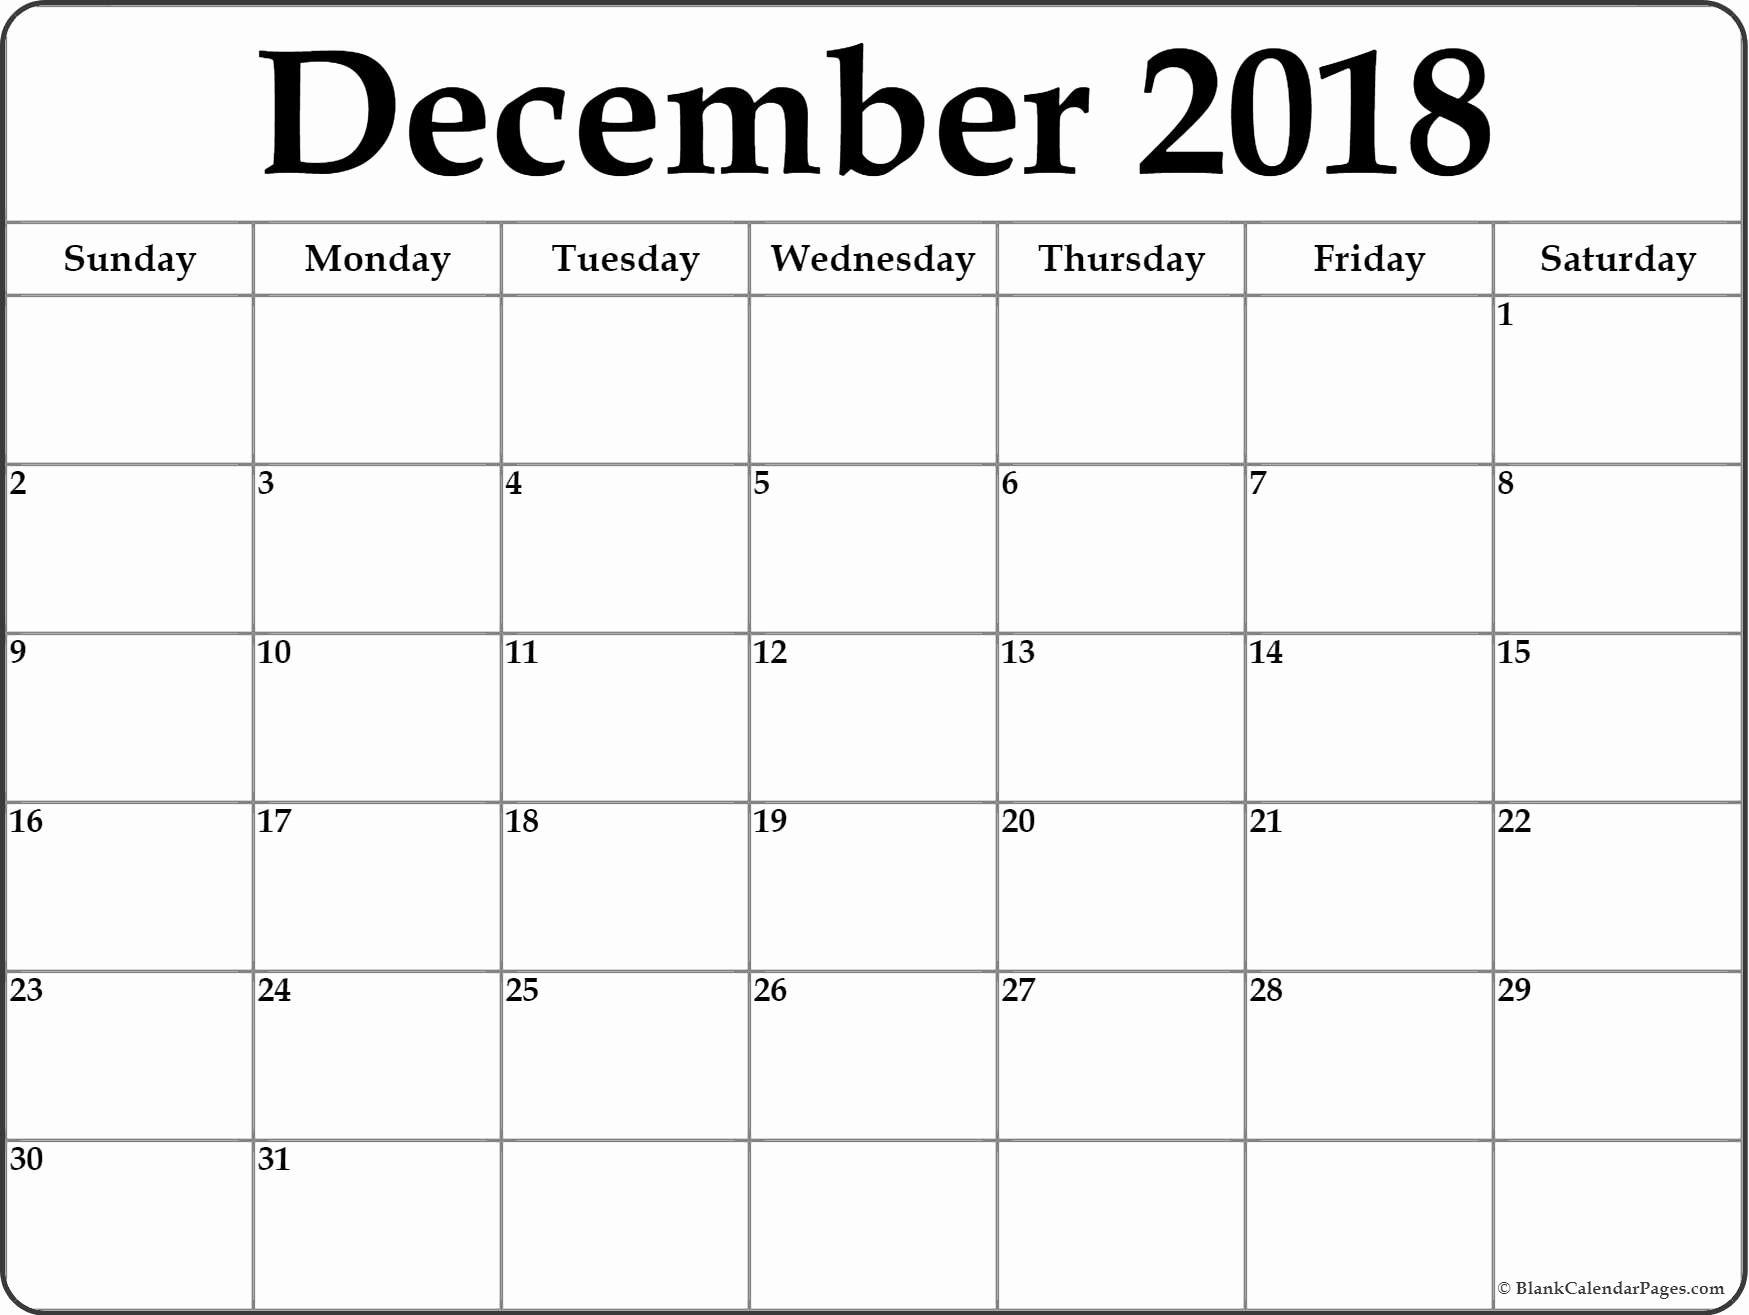 Calendar December 2018 And January 2019 | December 2018 Calendar regarding Blank Printable Calendars December